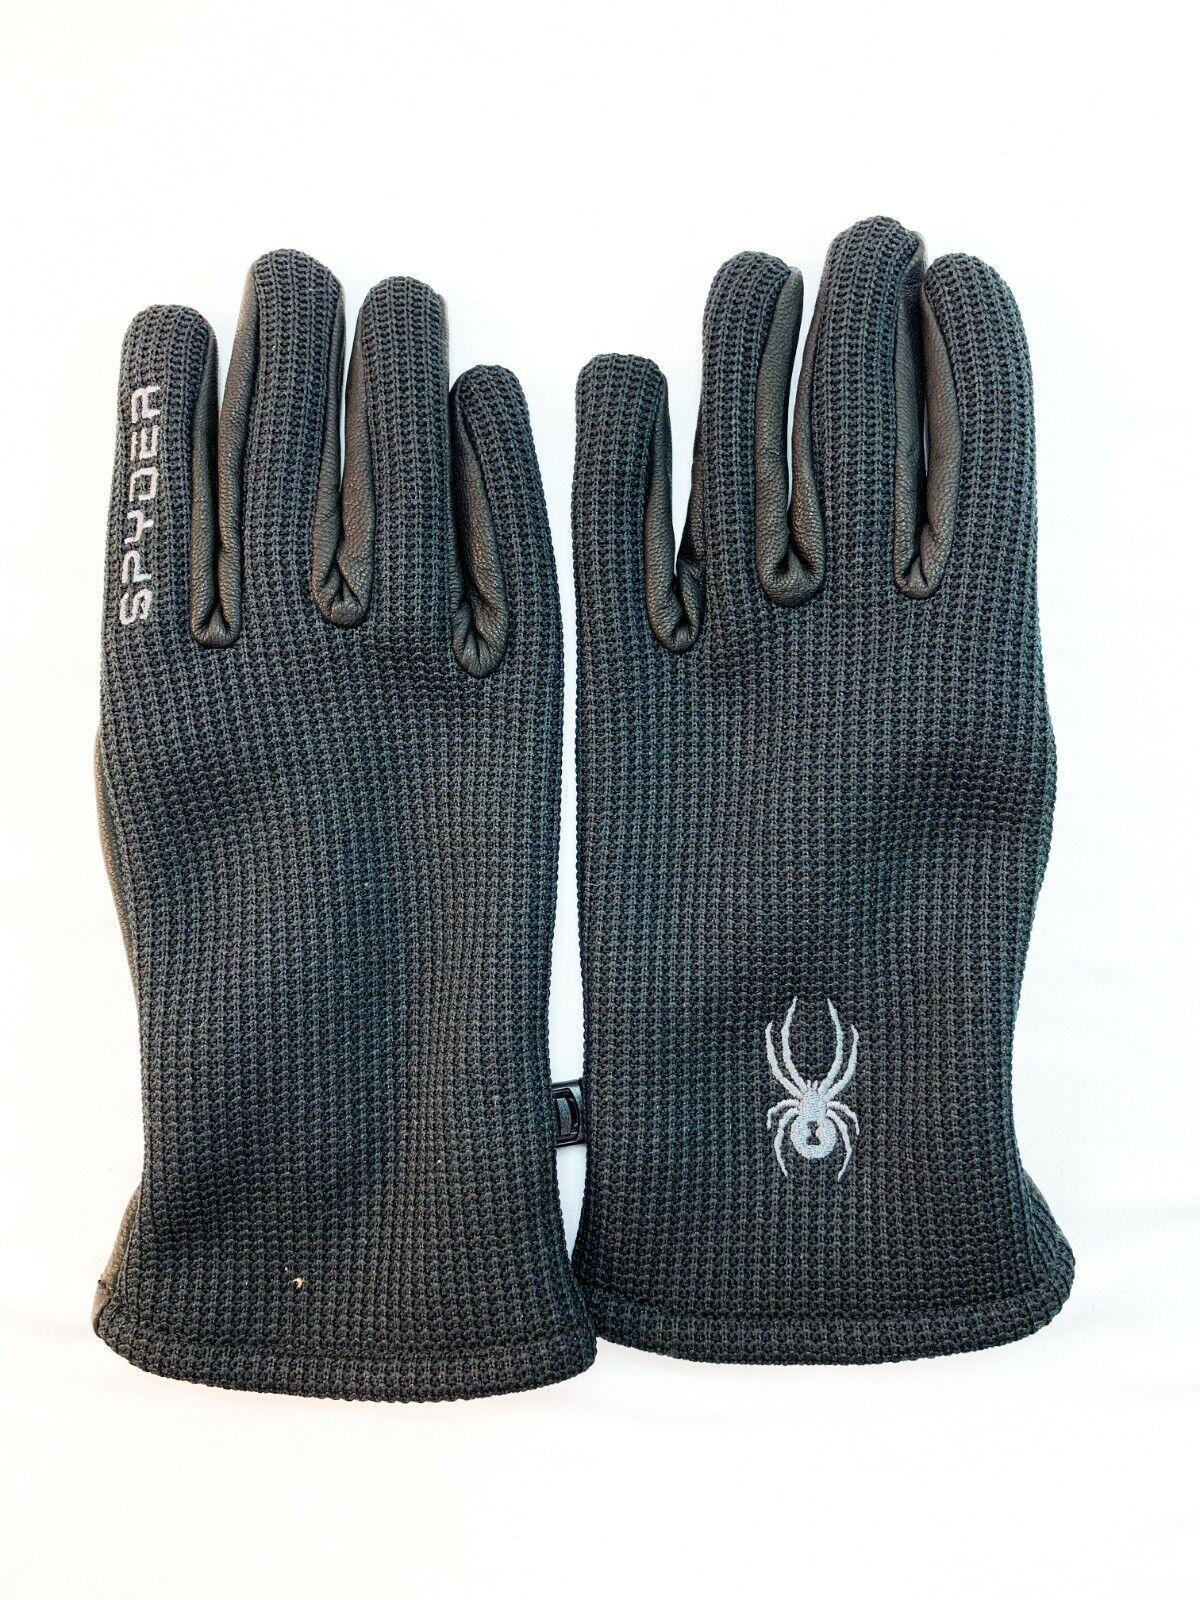 NWT Spyder Leather Palm Gloves, Black Size: L, Large